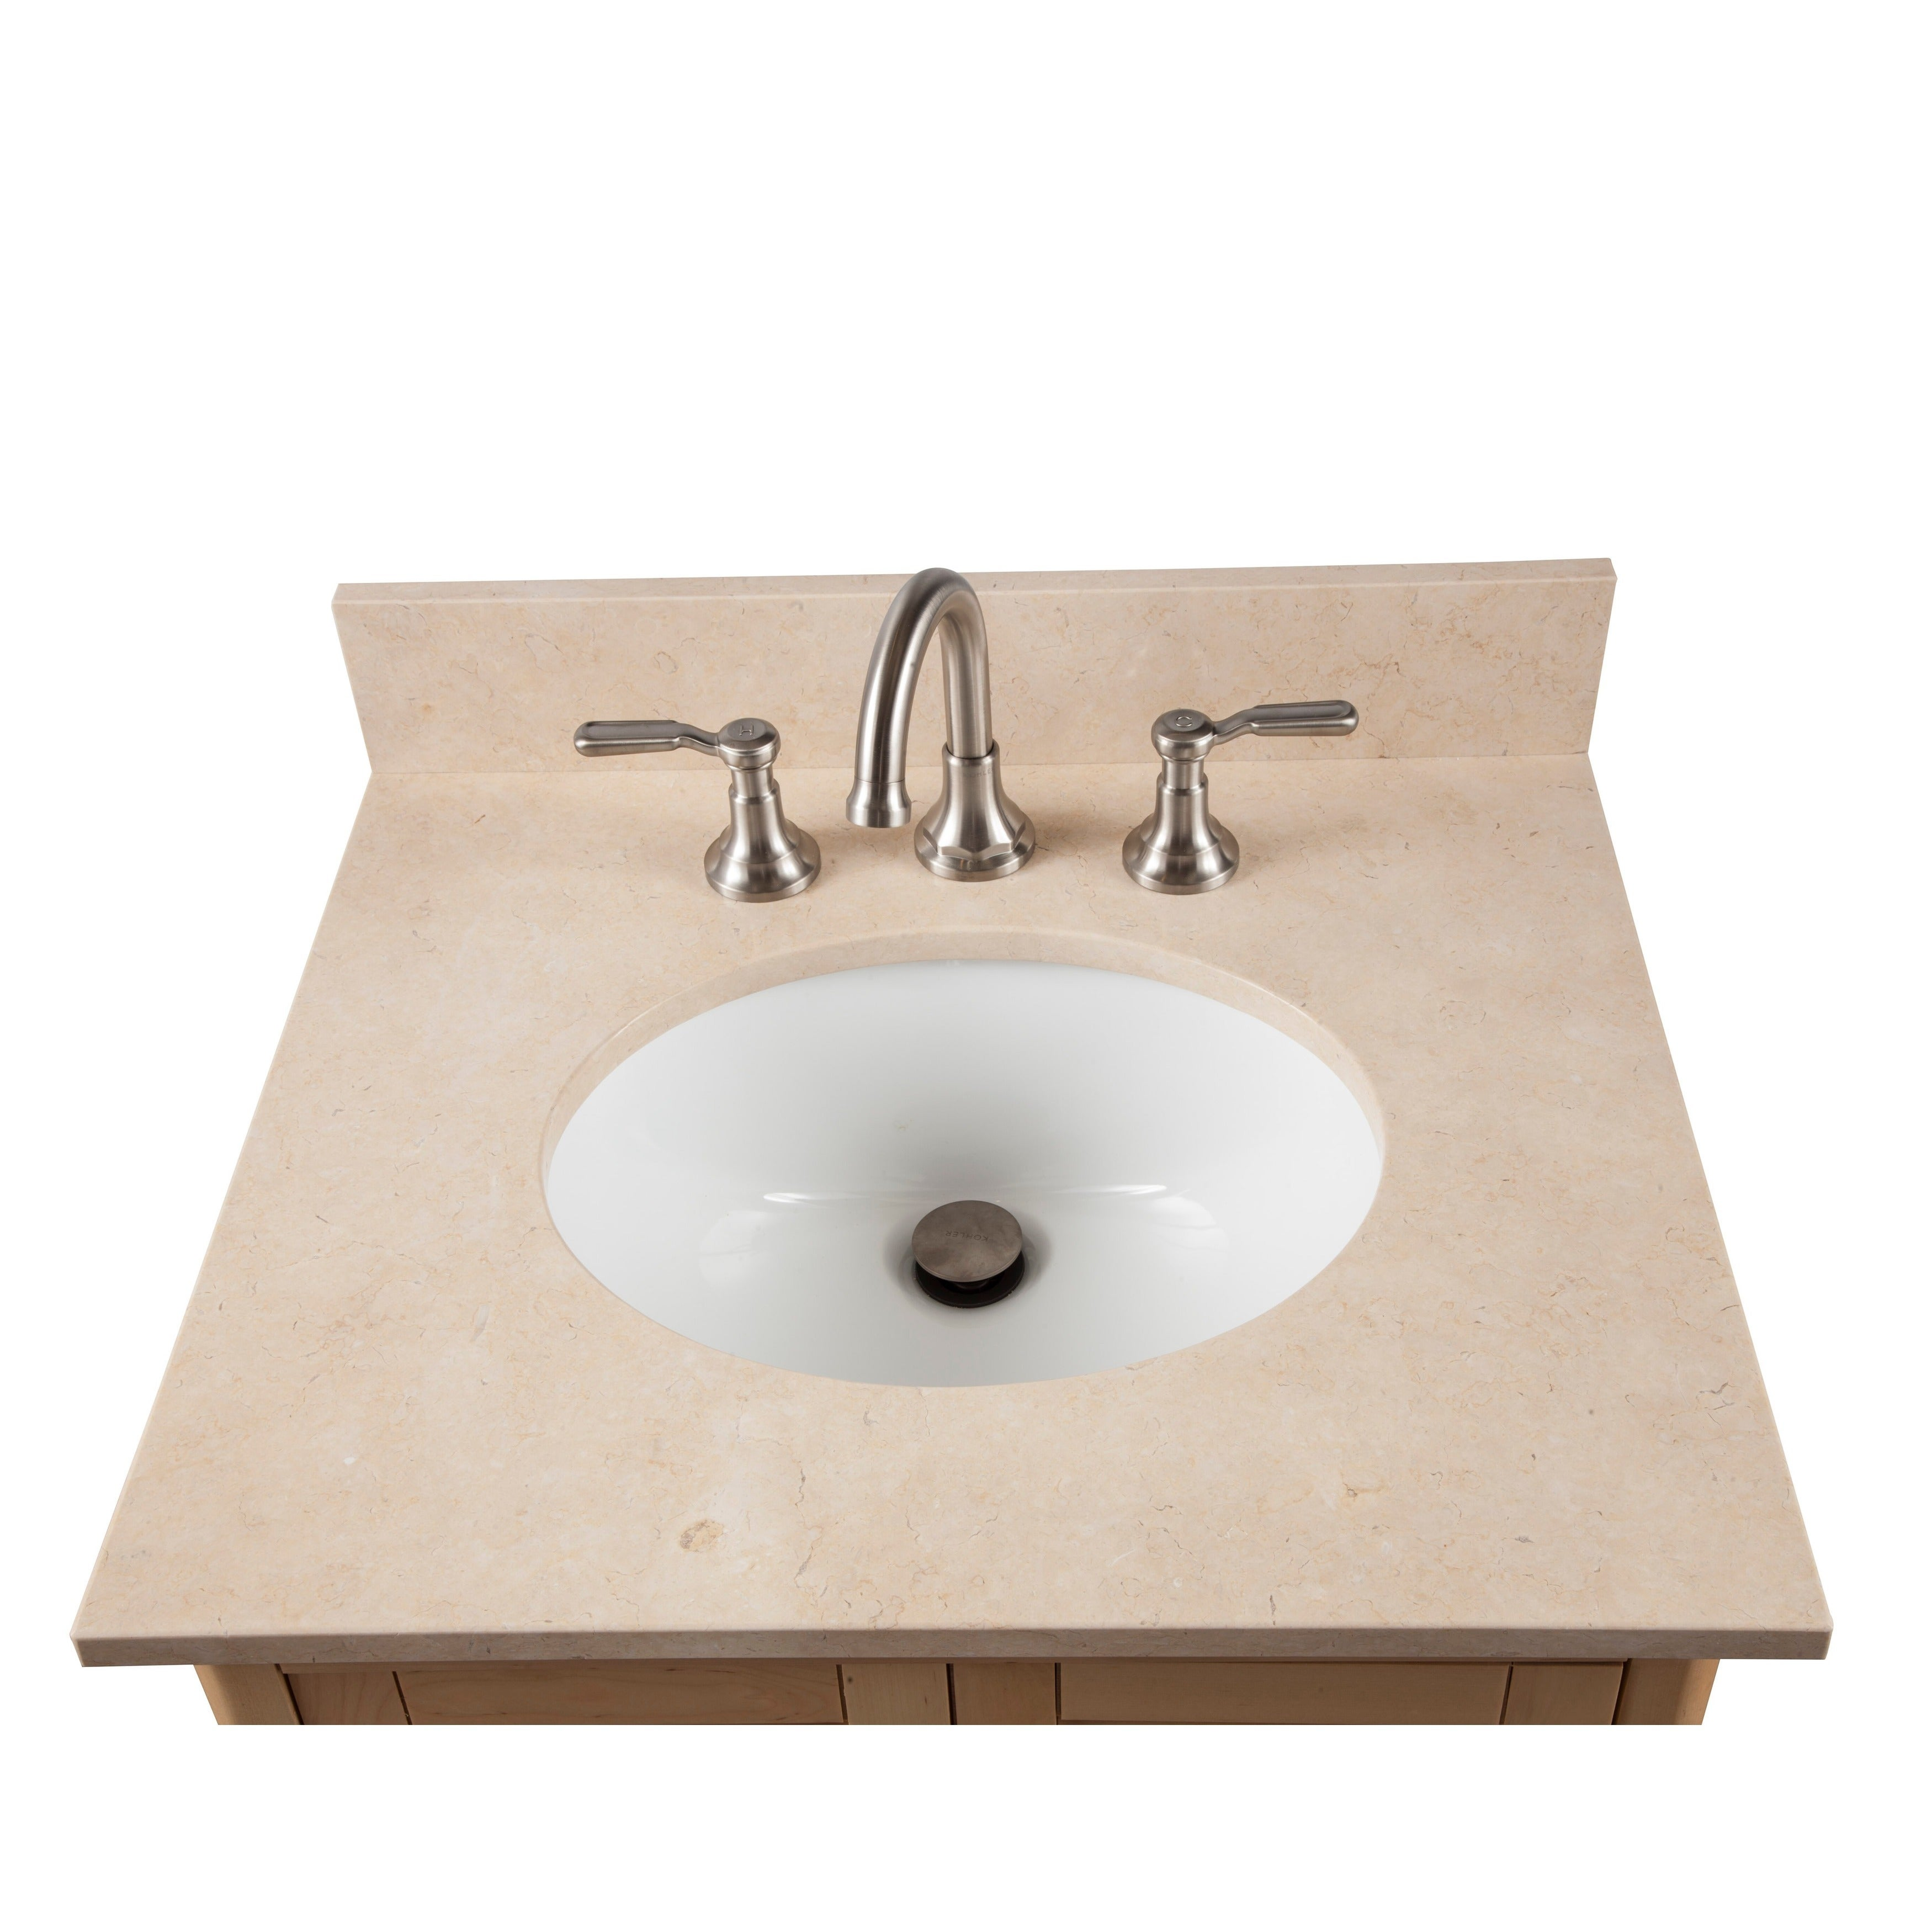 bathroom x inch fiber gallery modern deep wide decoration for creative rectangle depth proportions brown enchanting vanity